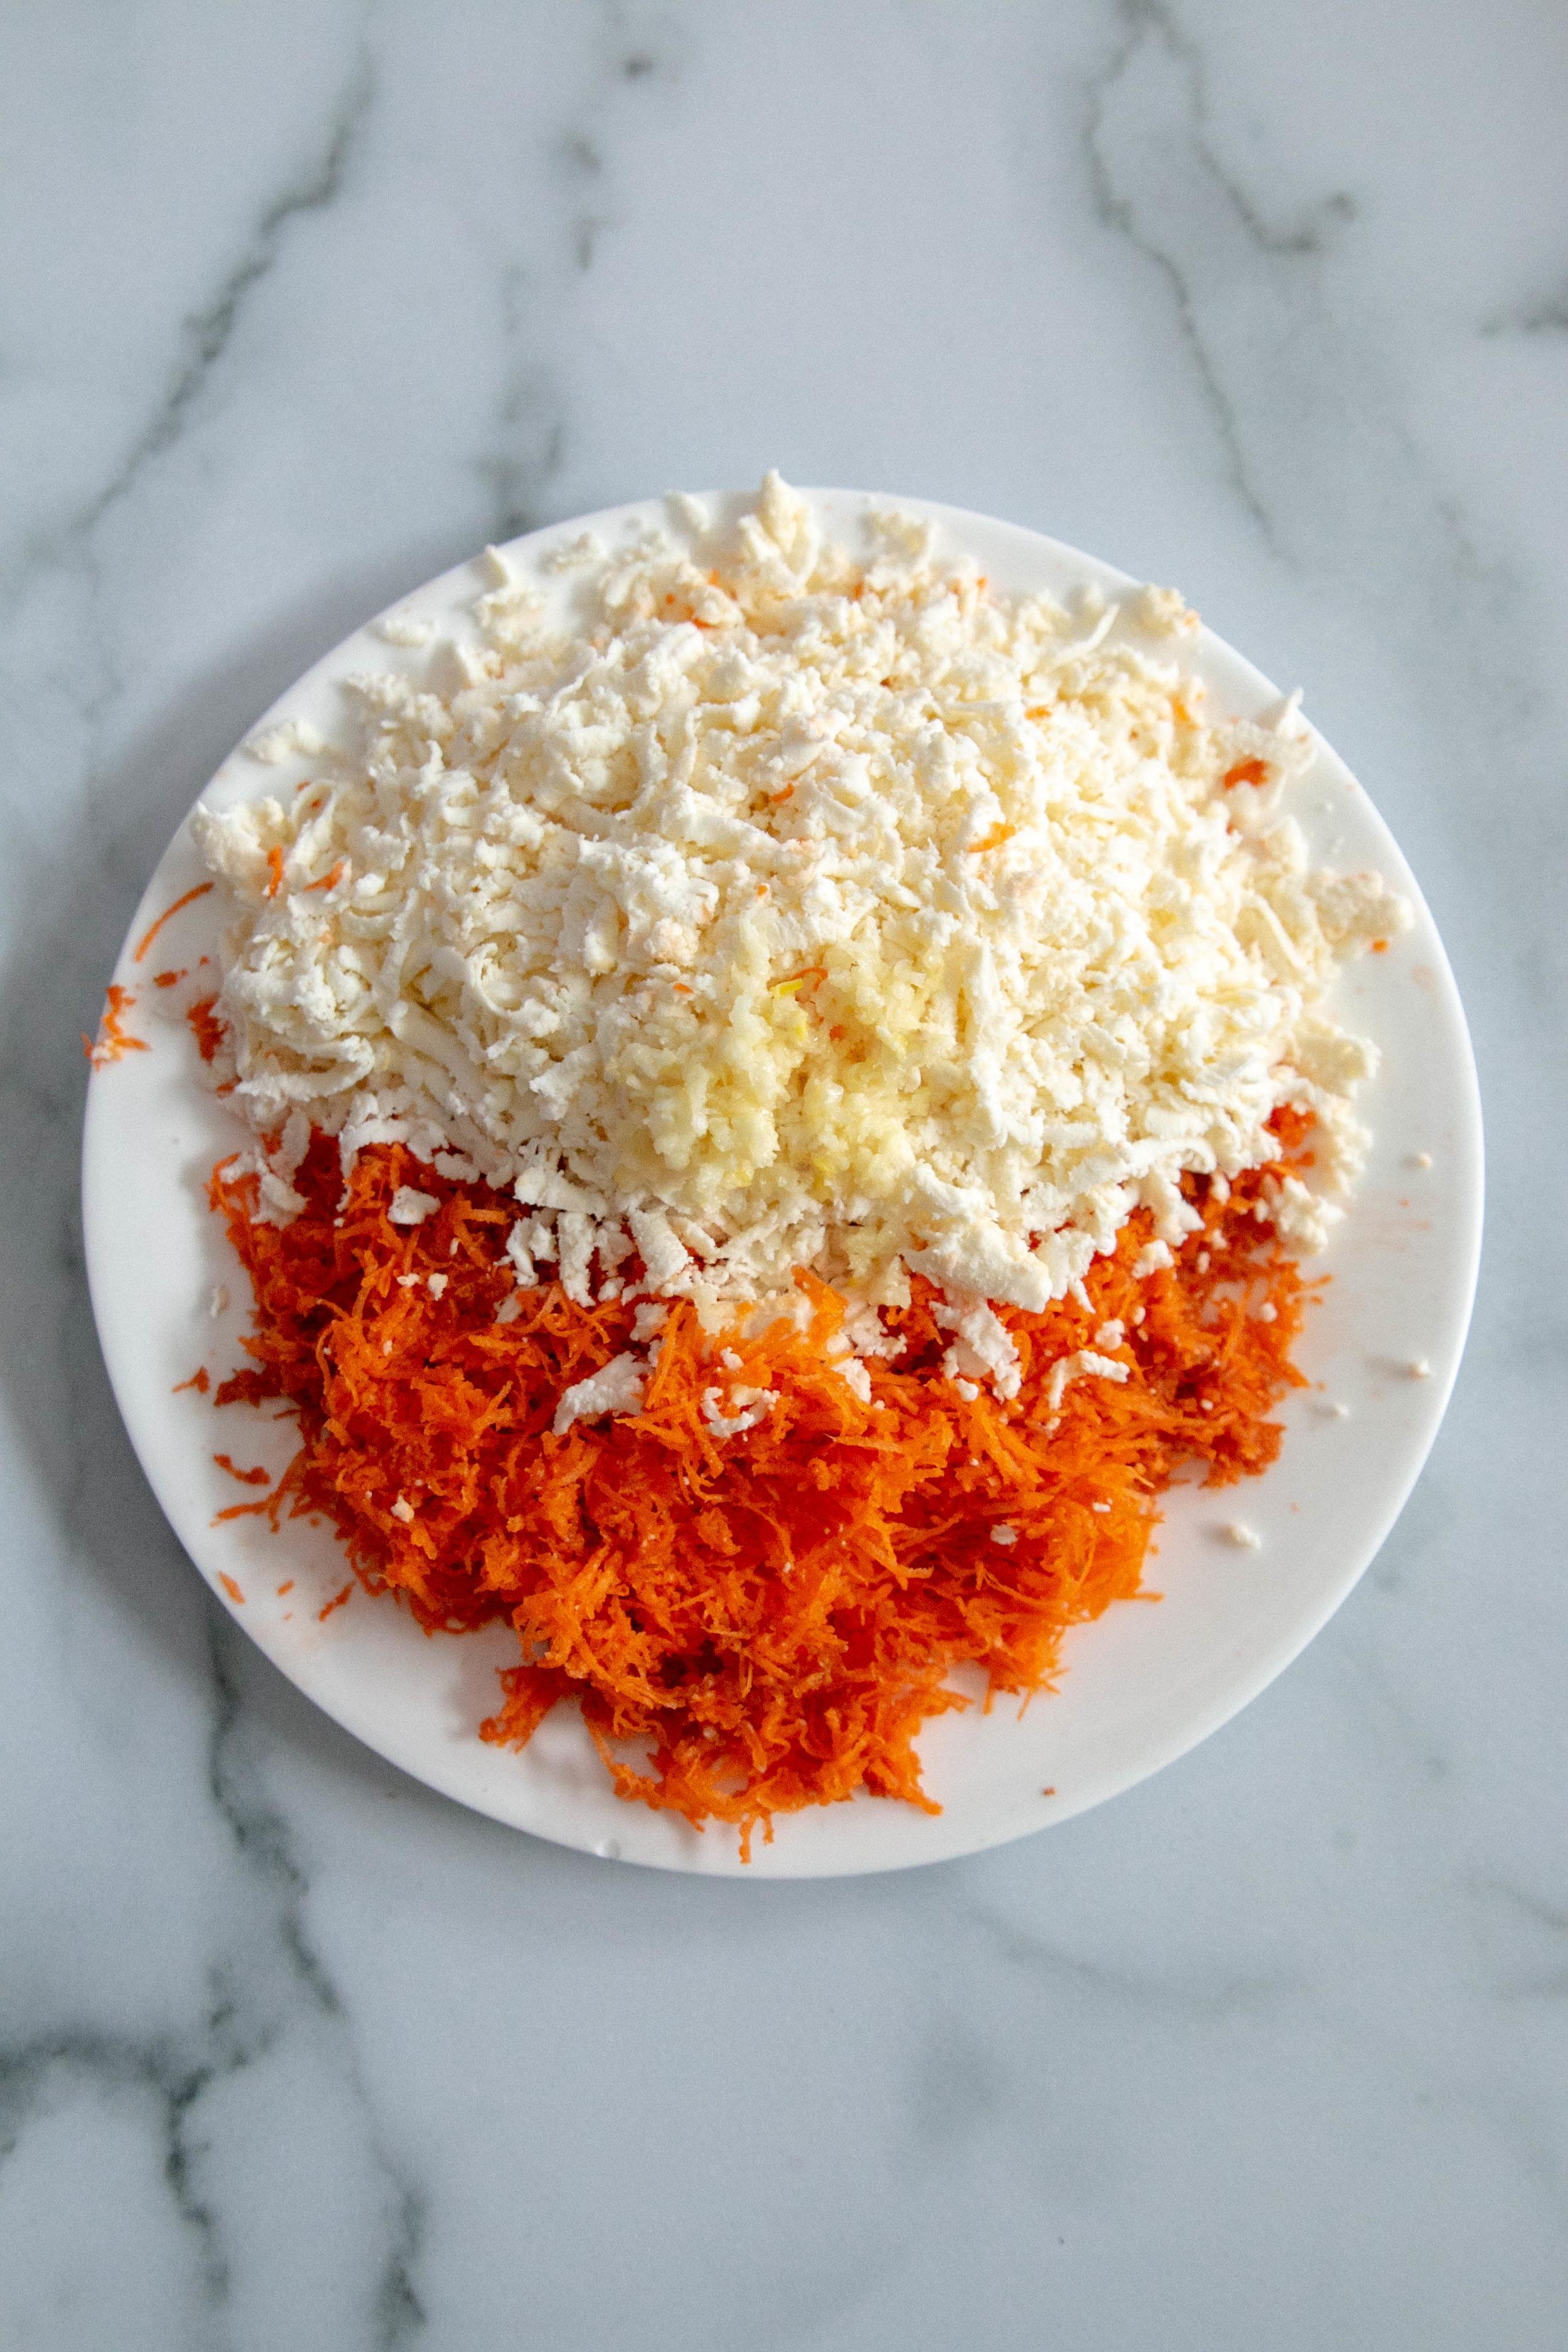 saladmenu baked carrot appetizer recipe 1.jpg